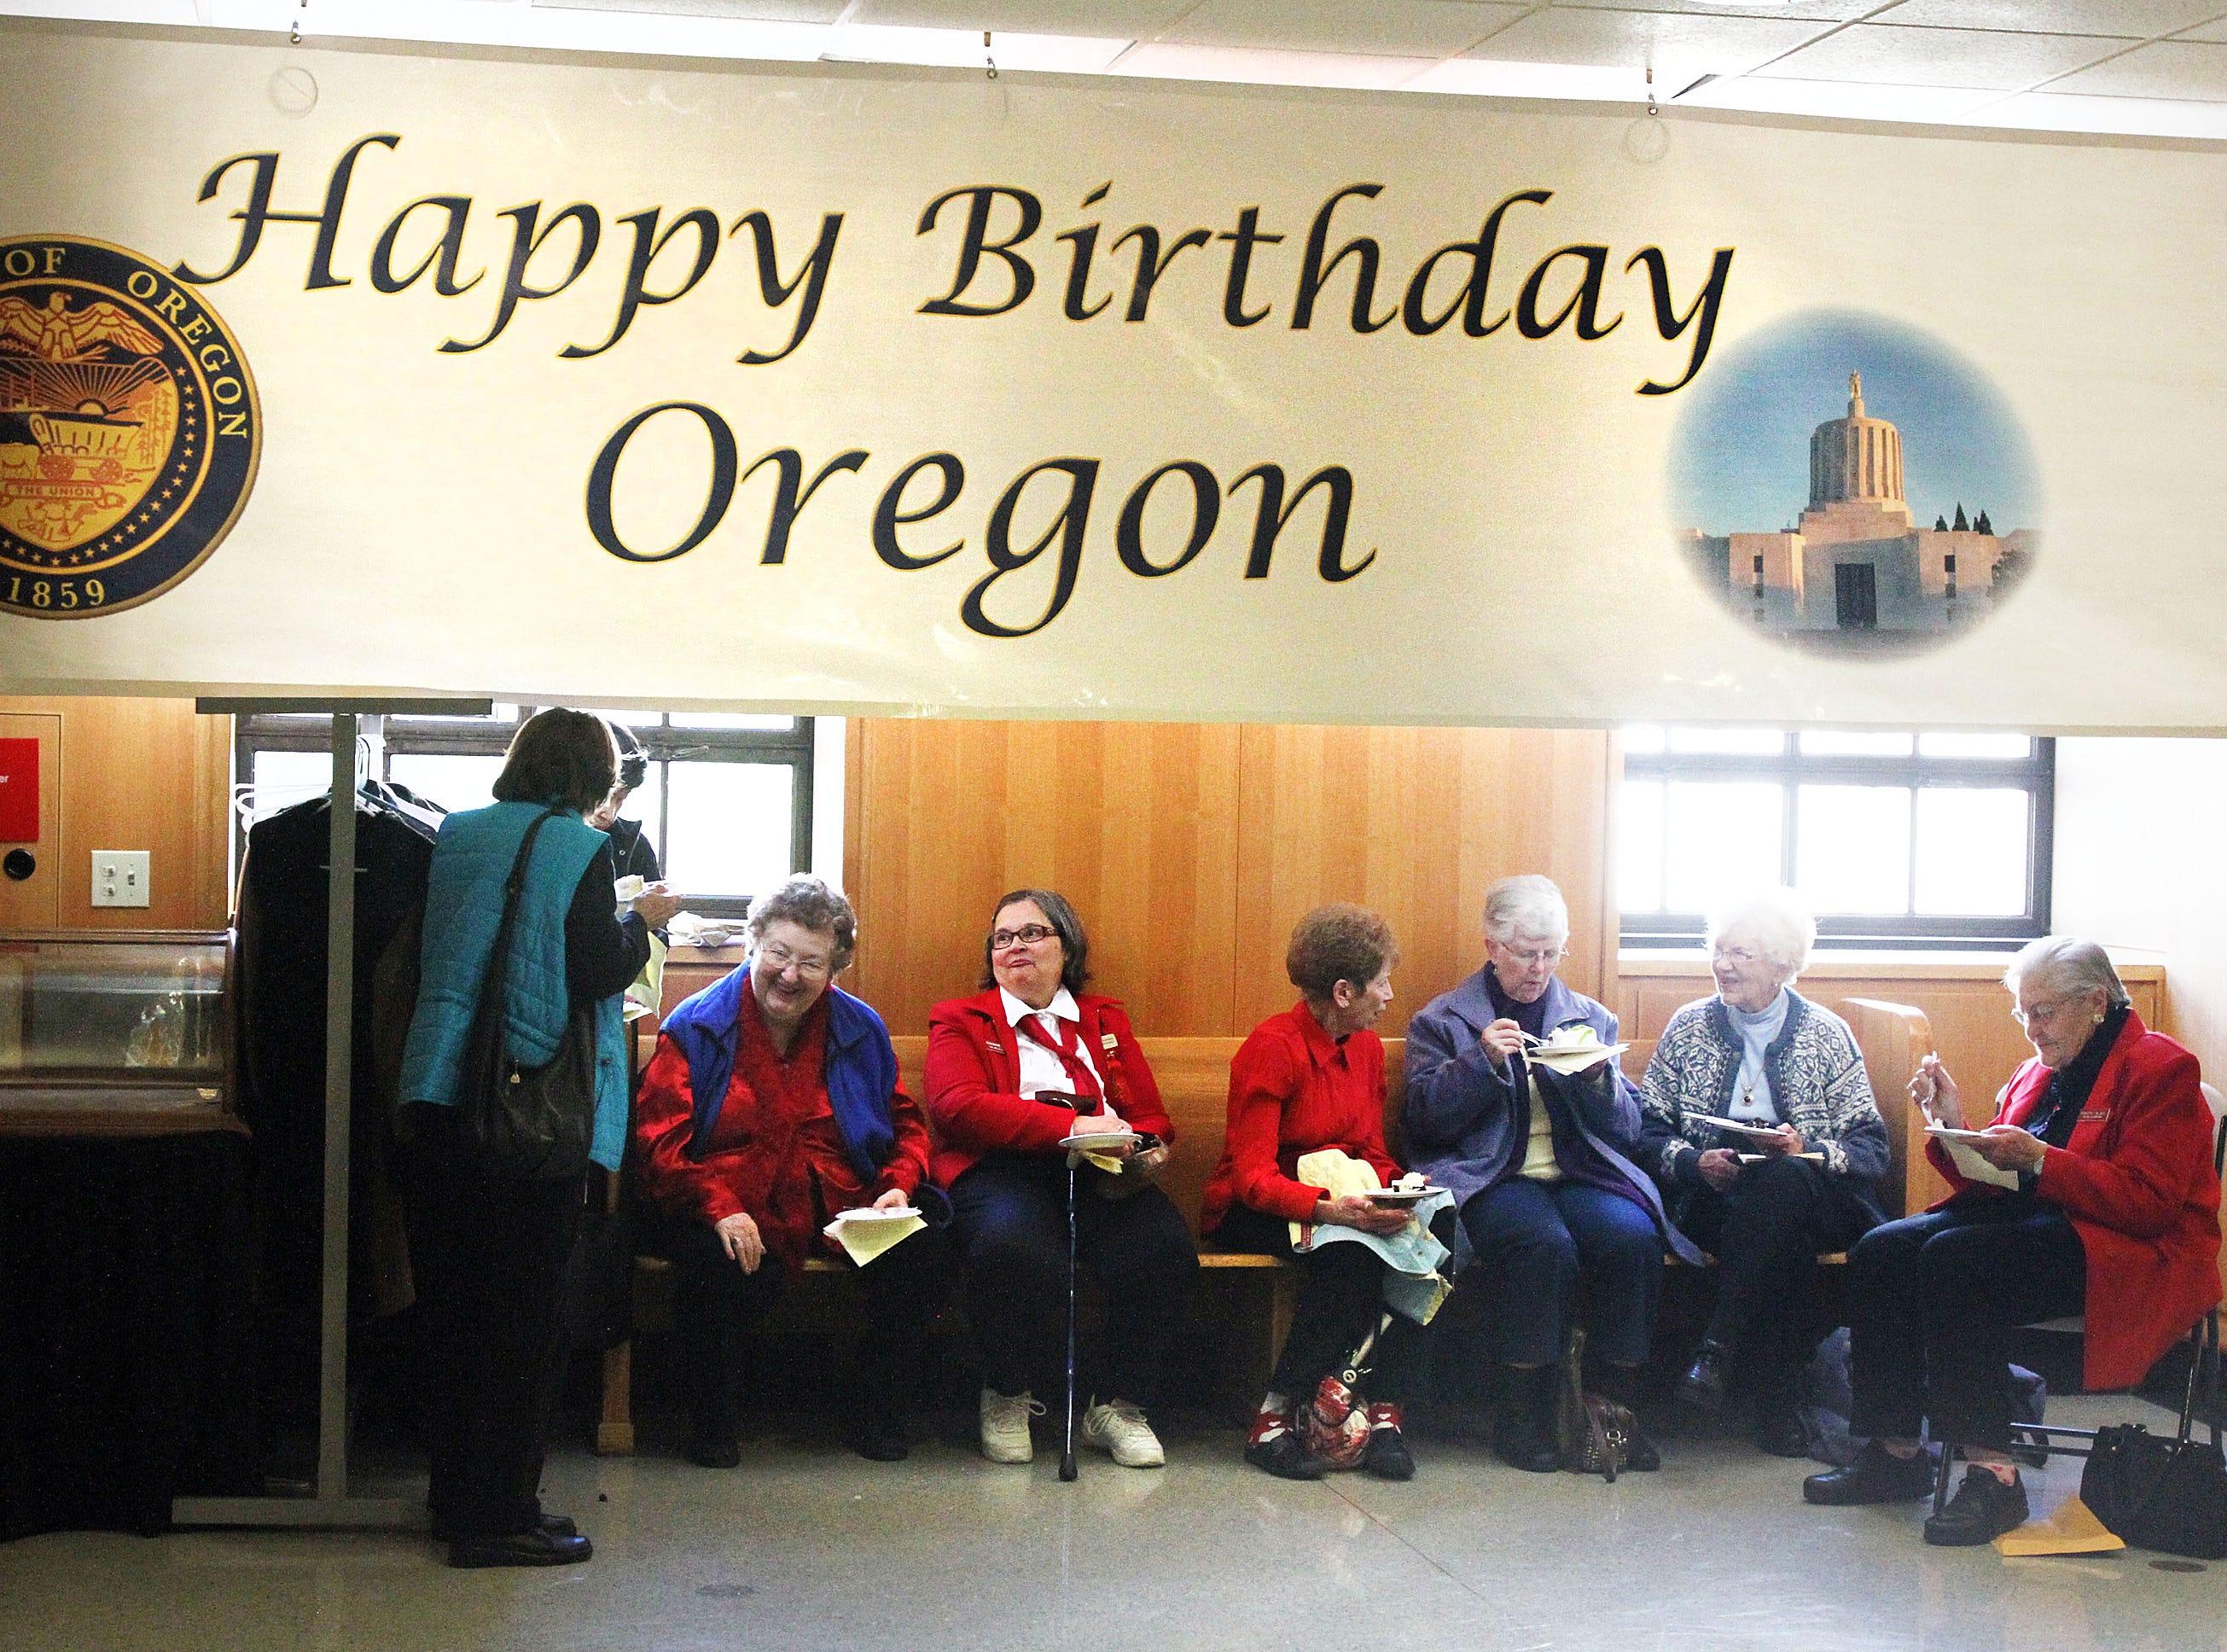 Oregon observes its 154th anniversary of statehood.